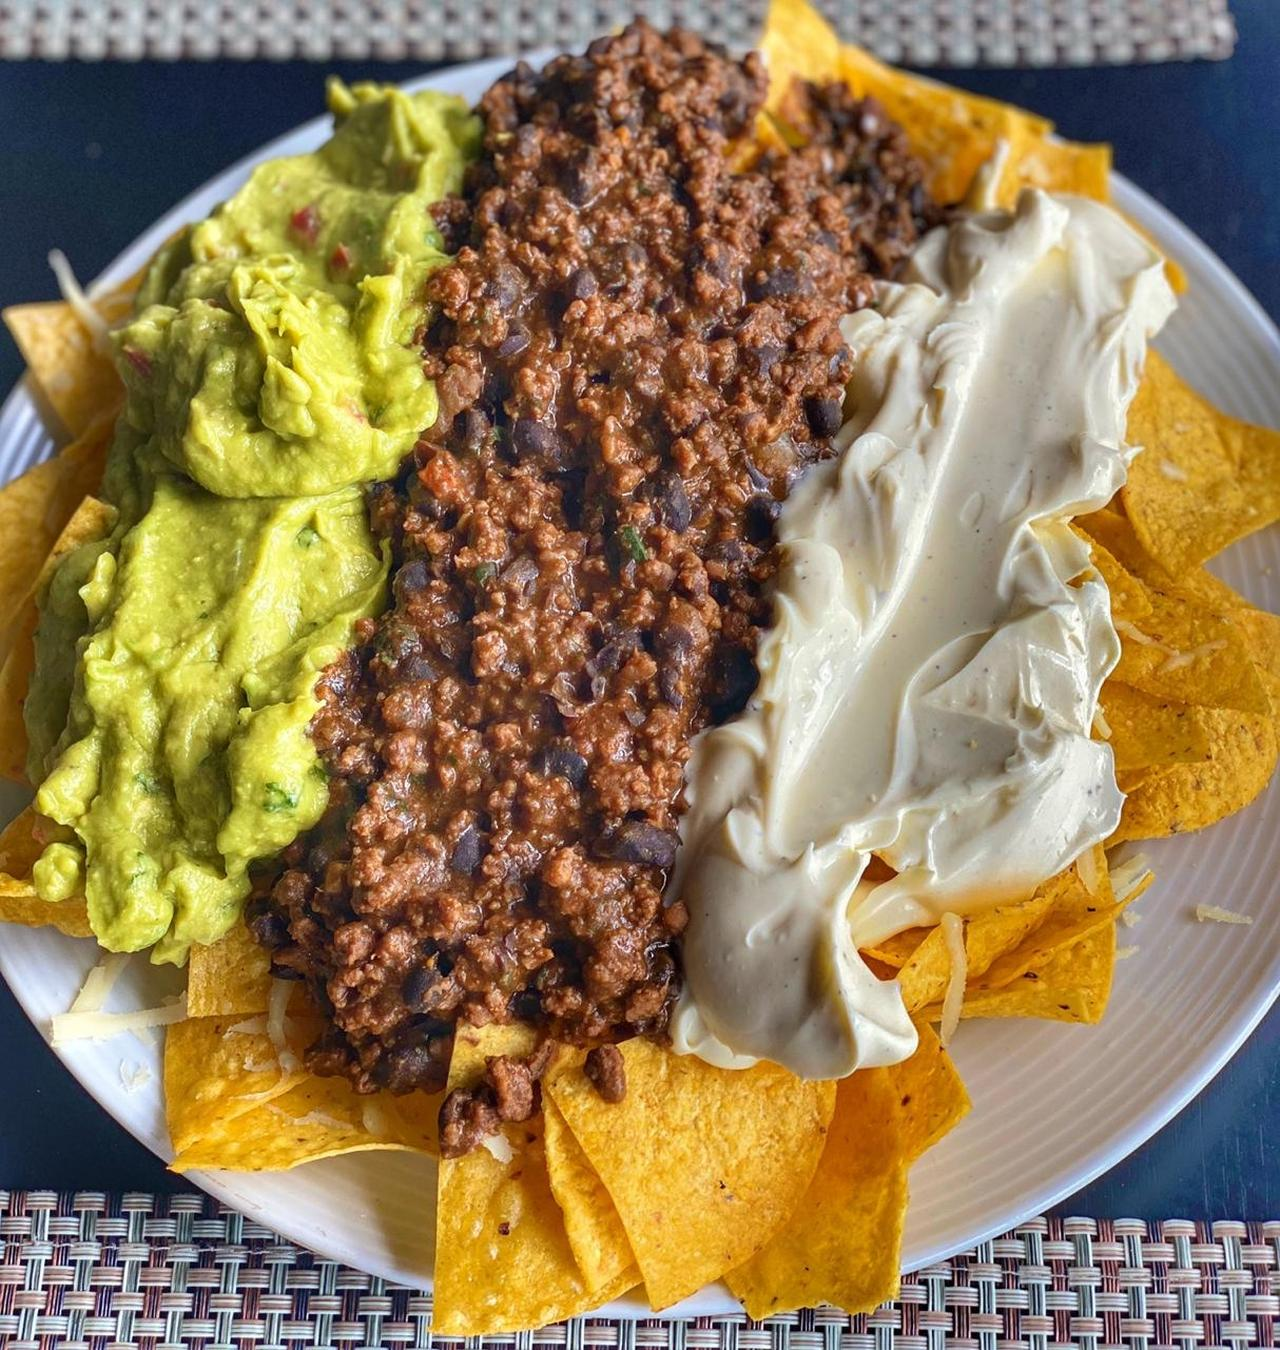 Comida mexicana - Restaurante Passauna Paddle Club